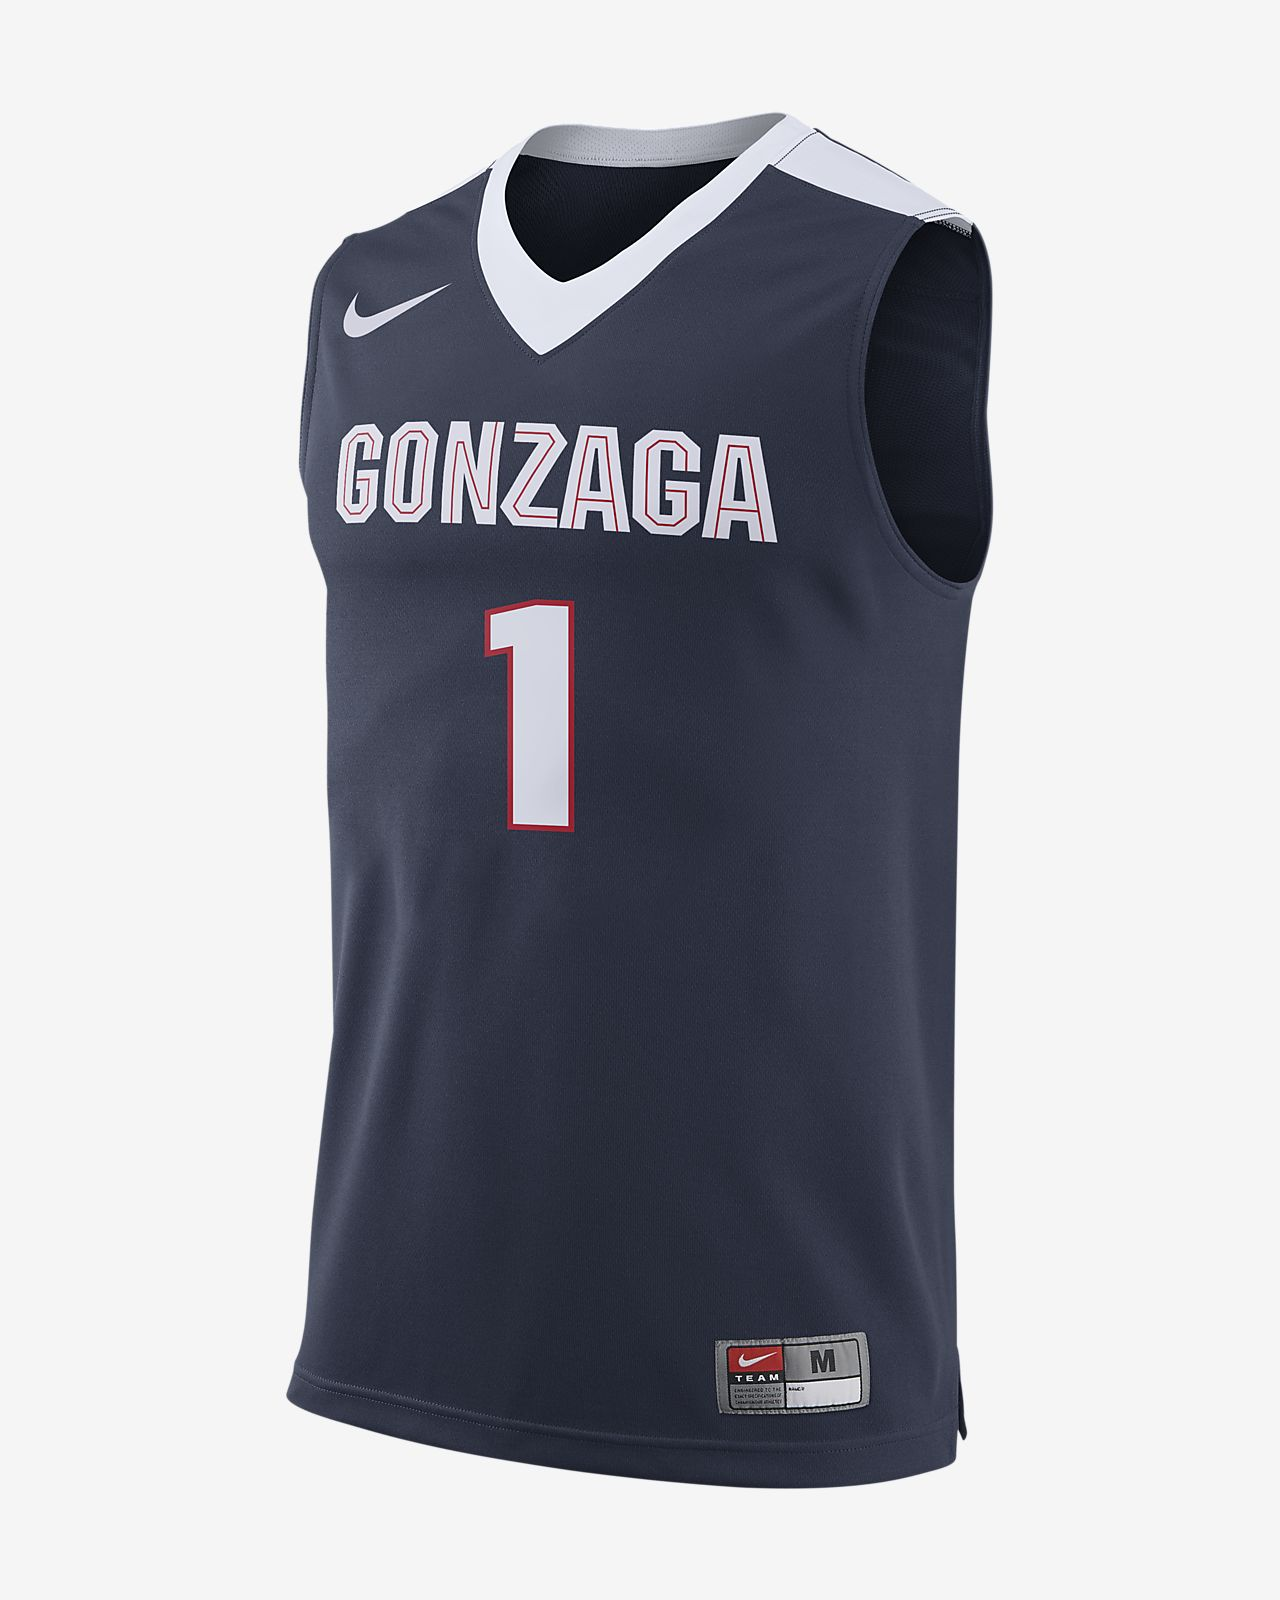 half off ed7cc 3517b Nike College Replica (Gonzaga) Men's Basketball Jersey